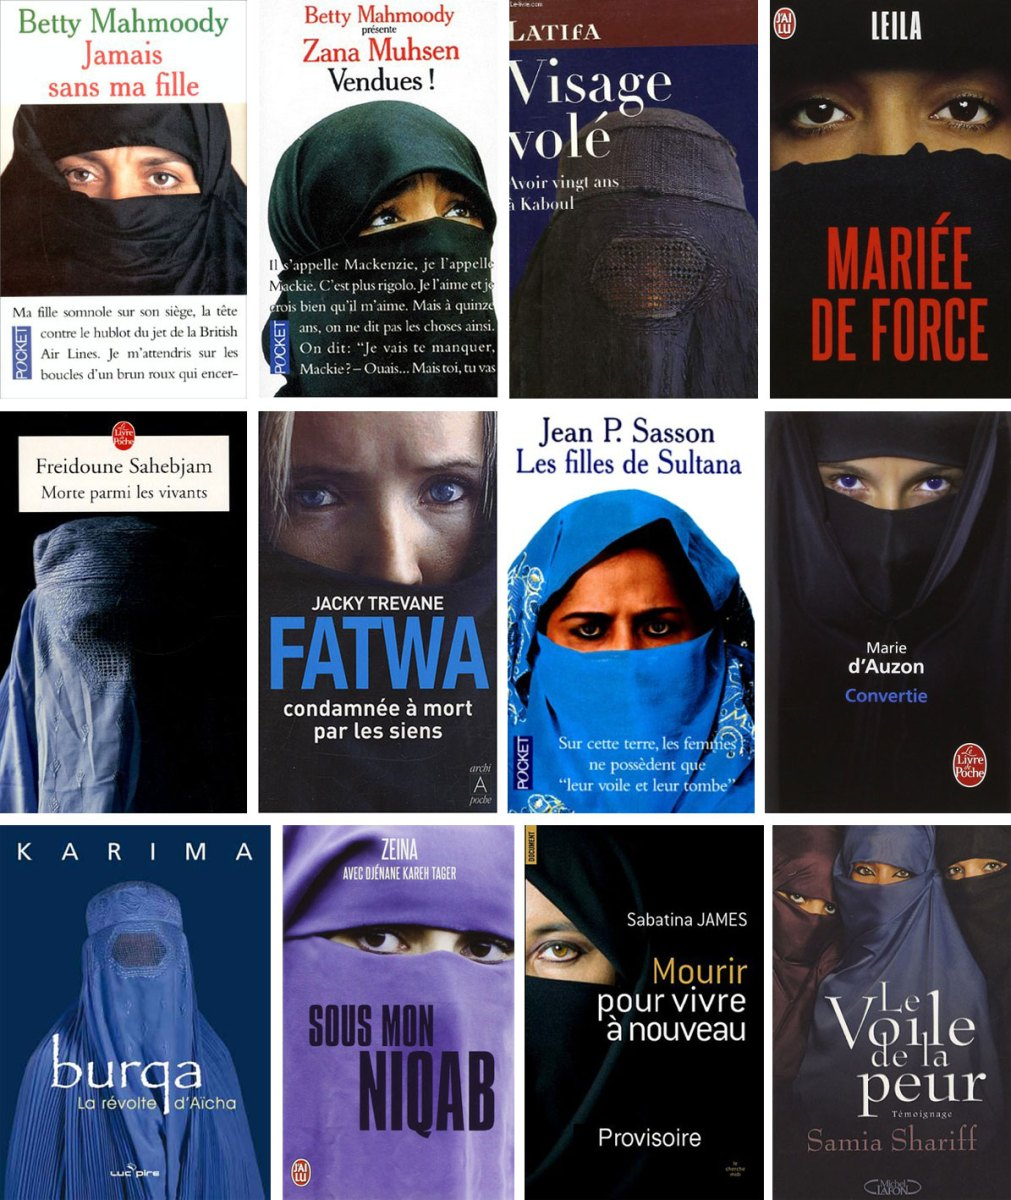 Désigner la dissimulation, figure de l'islamophobie